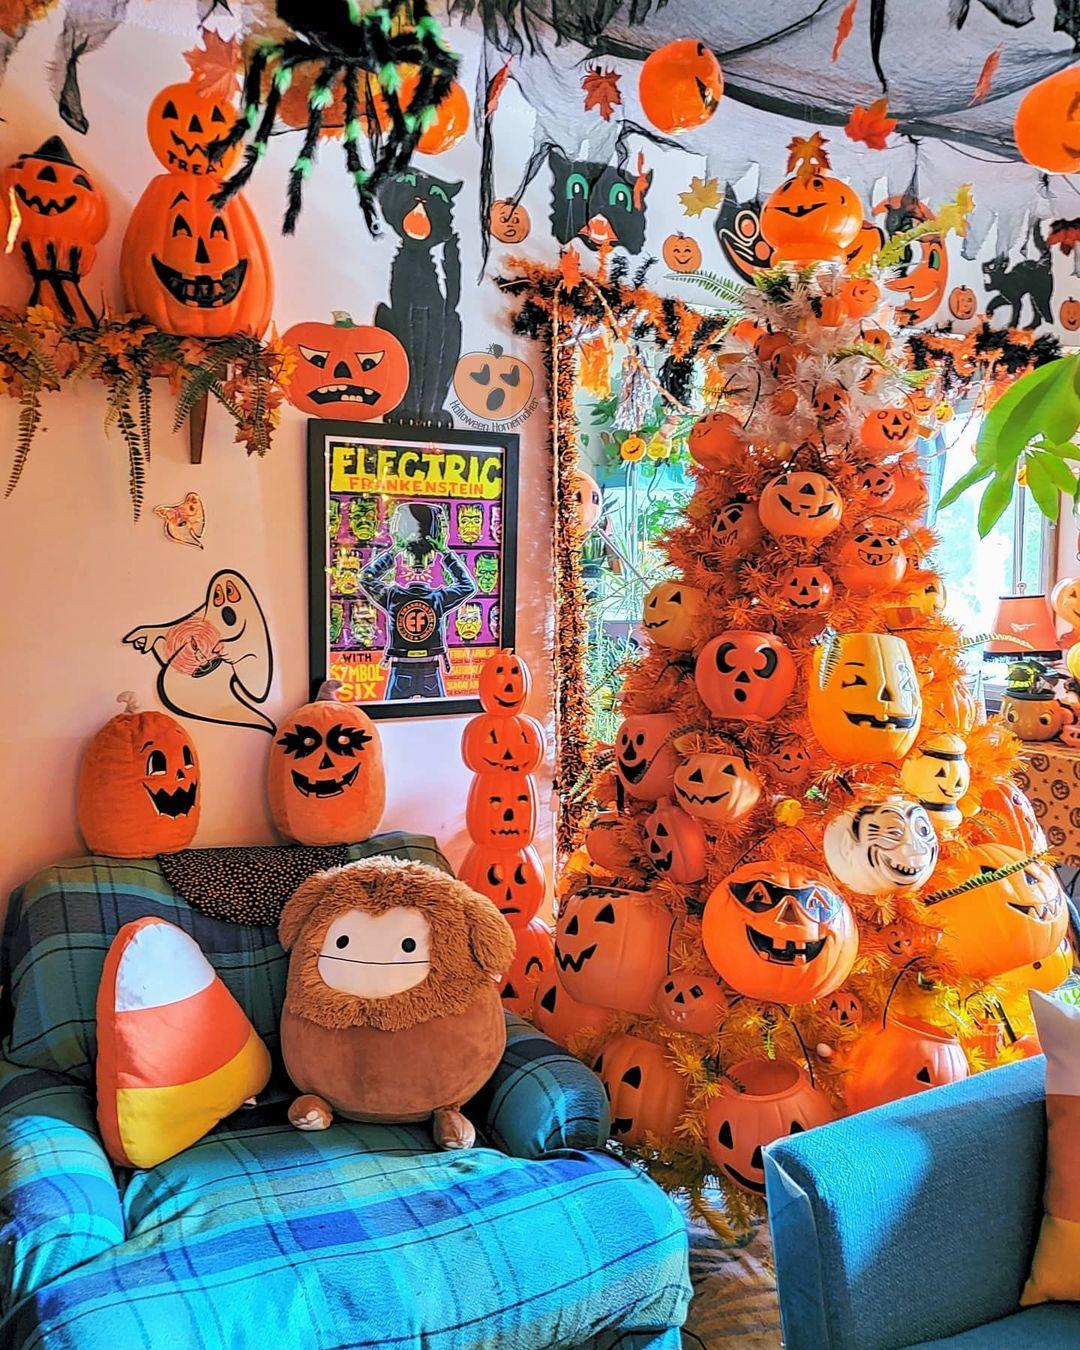 Orange Halloween tree with lots of pumpkins